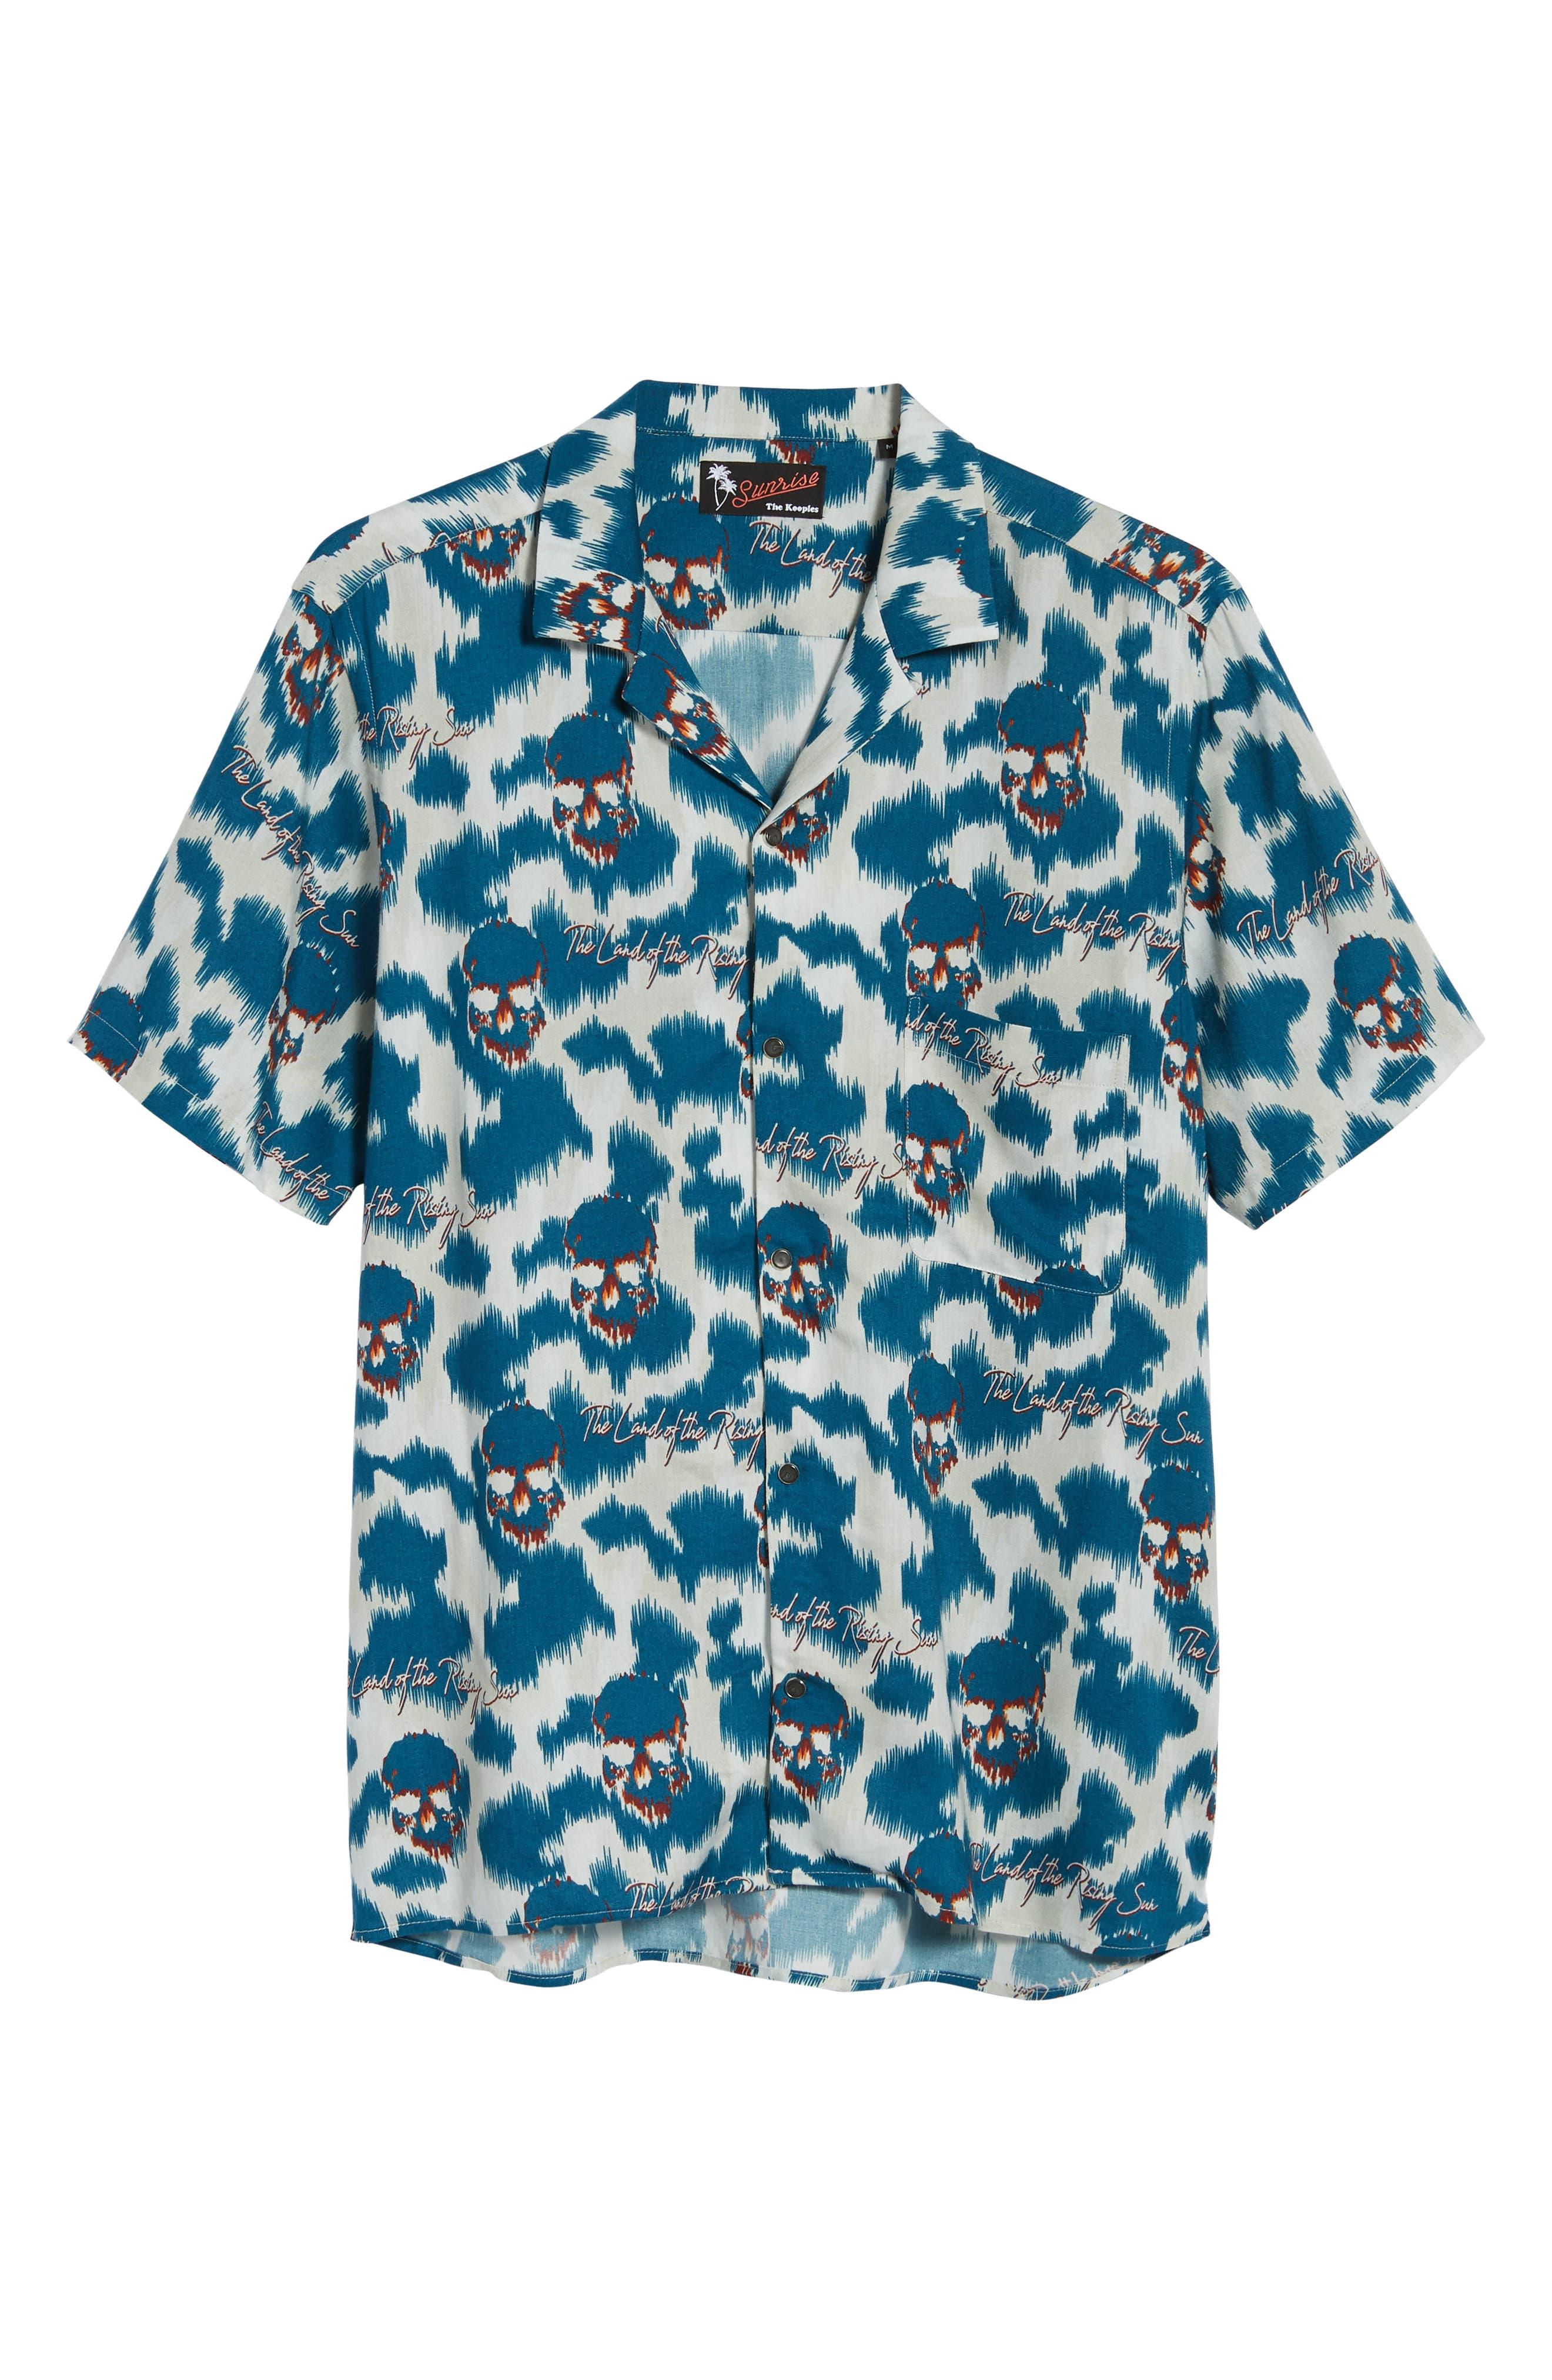 THE KOOPLES,                             Regular Fit Hawaiian Shirt,                             Alternate thumbnail 6, color,                             400